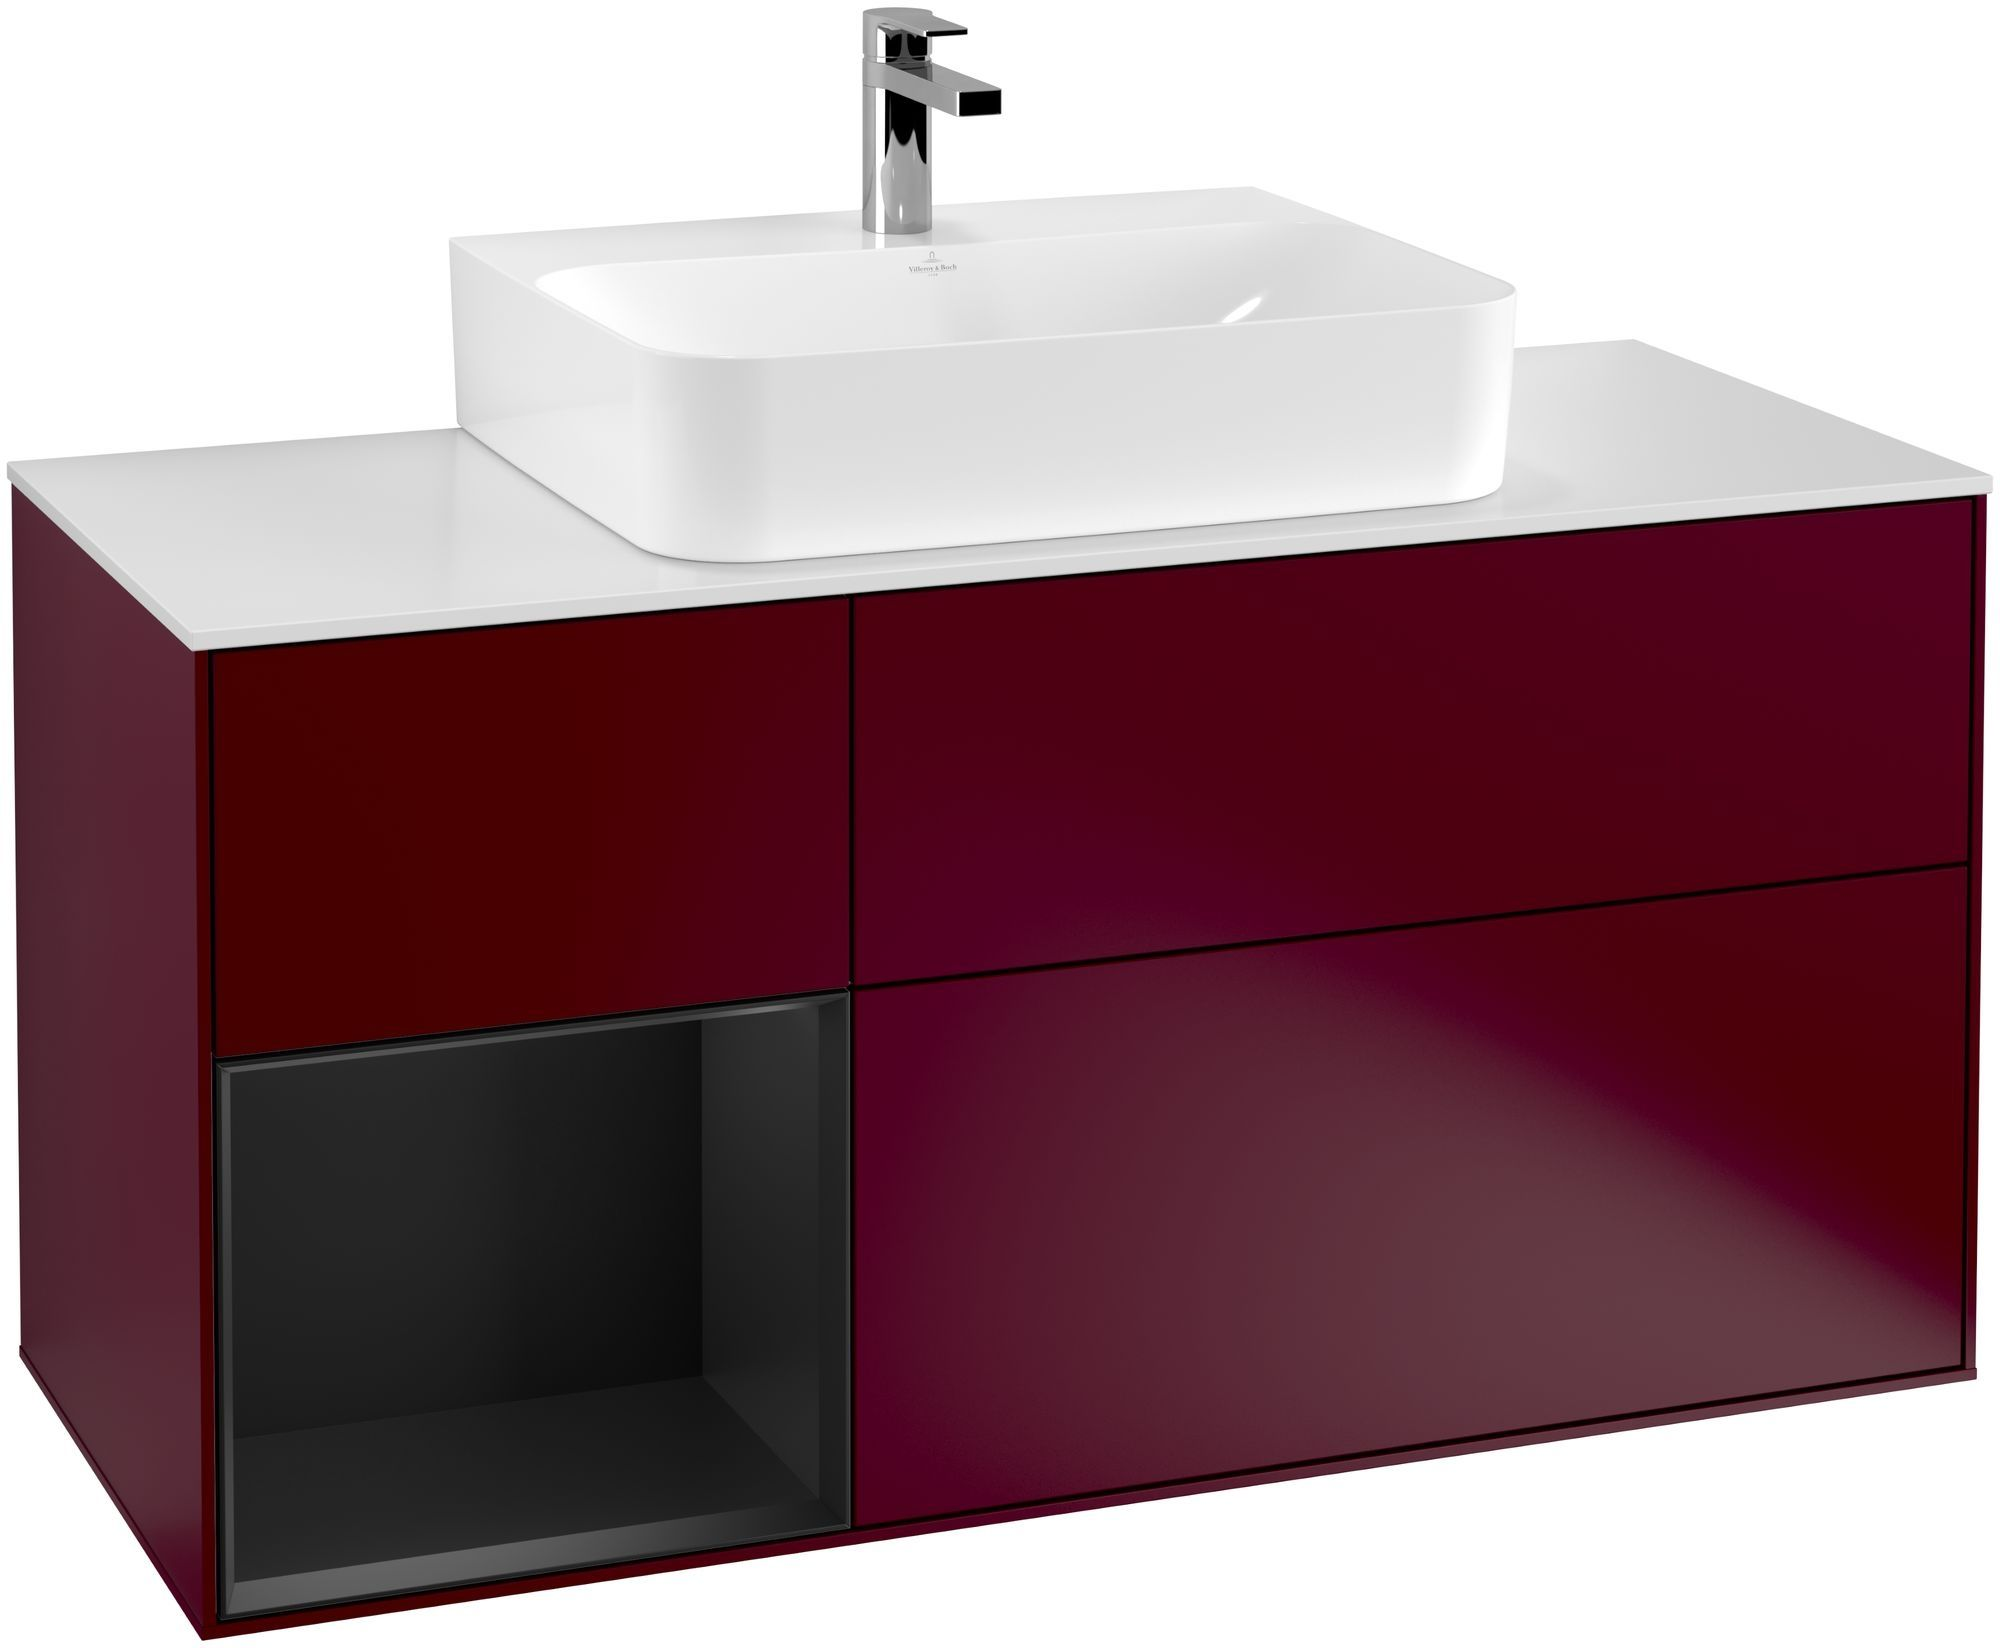 Villeroy & Boch Finion G16 Waschtischunterschrank mit Regalelement 3 Auszüge Waschtisch mittig LED-Beleuchtung B:120xH:60,3xT:50,1cm Front, Korpus: Peony, Regal: Black Matt Lacquer, Glasplatte: White Matt G161PDHB